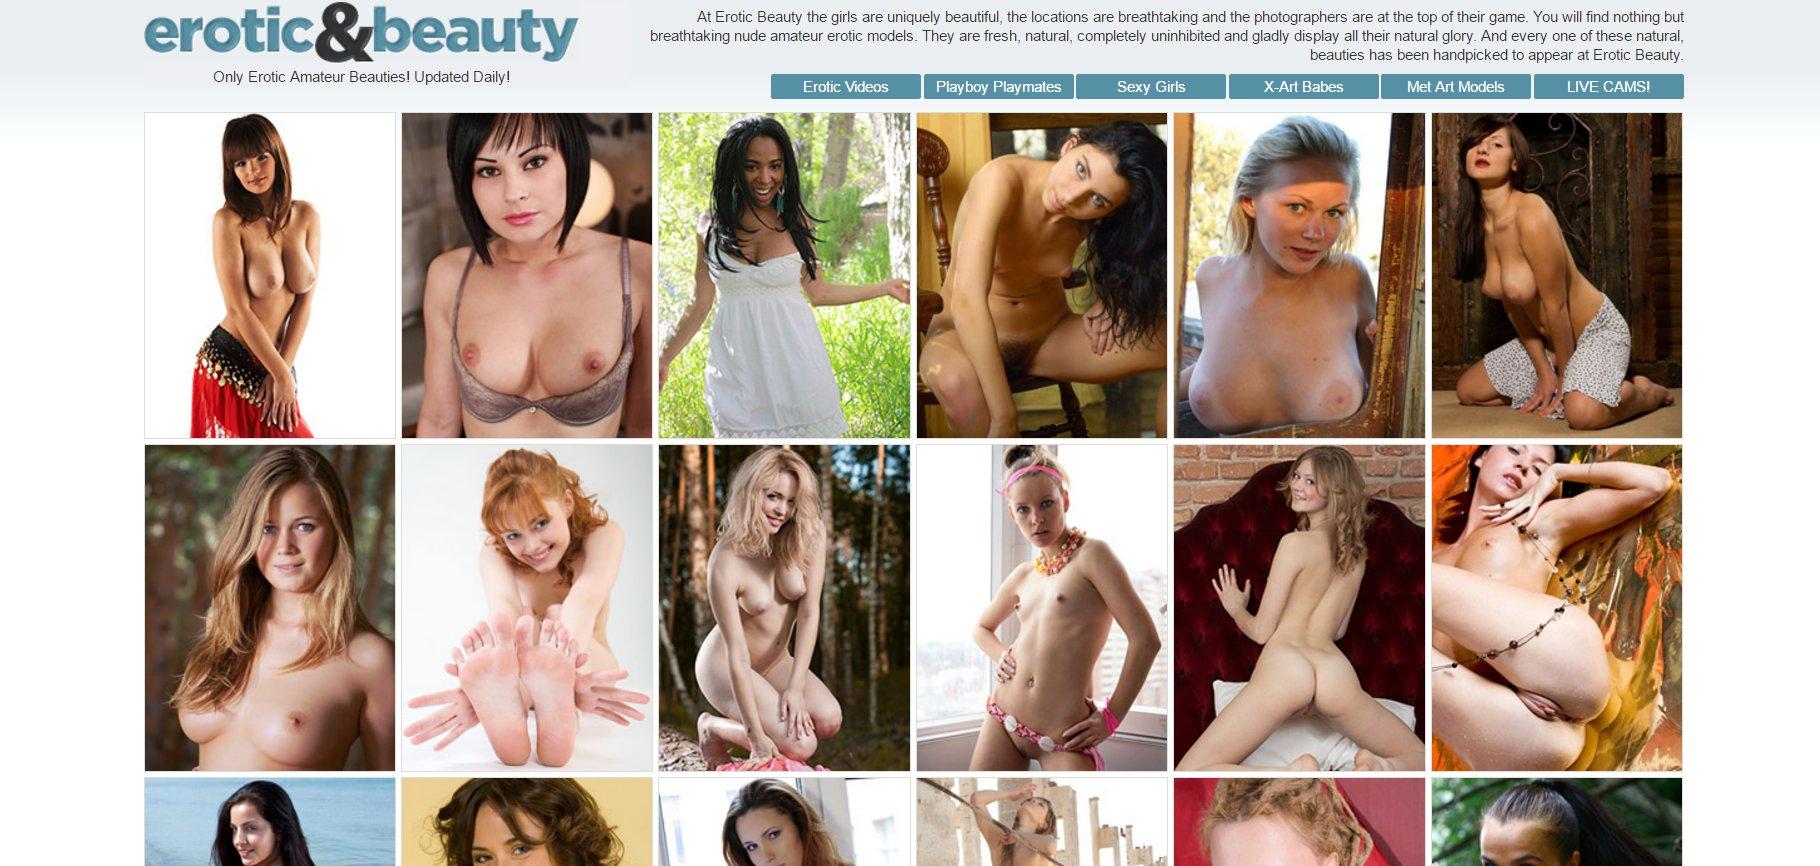 Eroticandbeauty.com